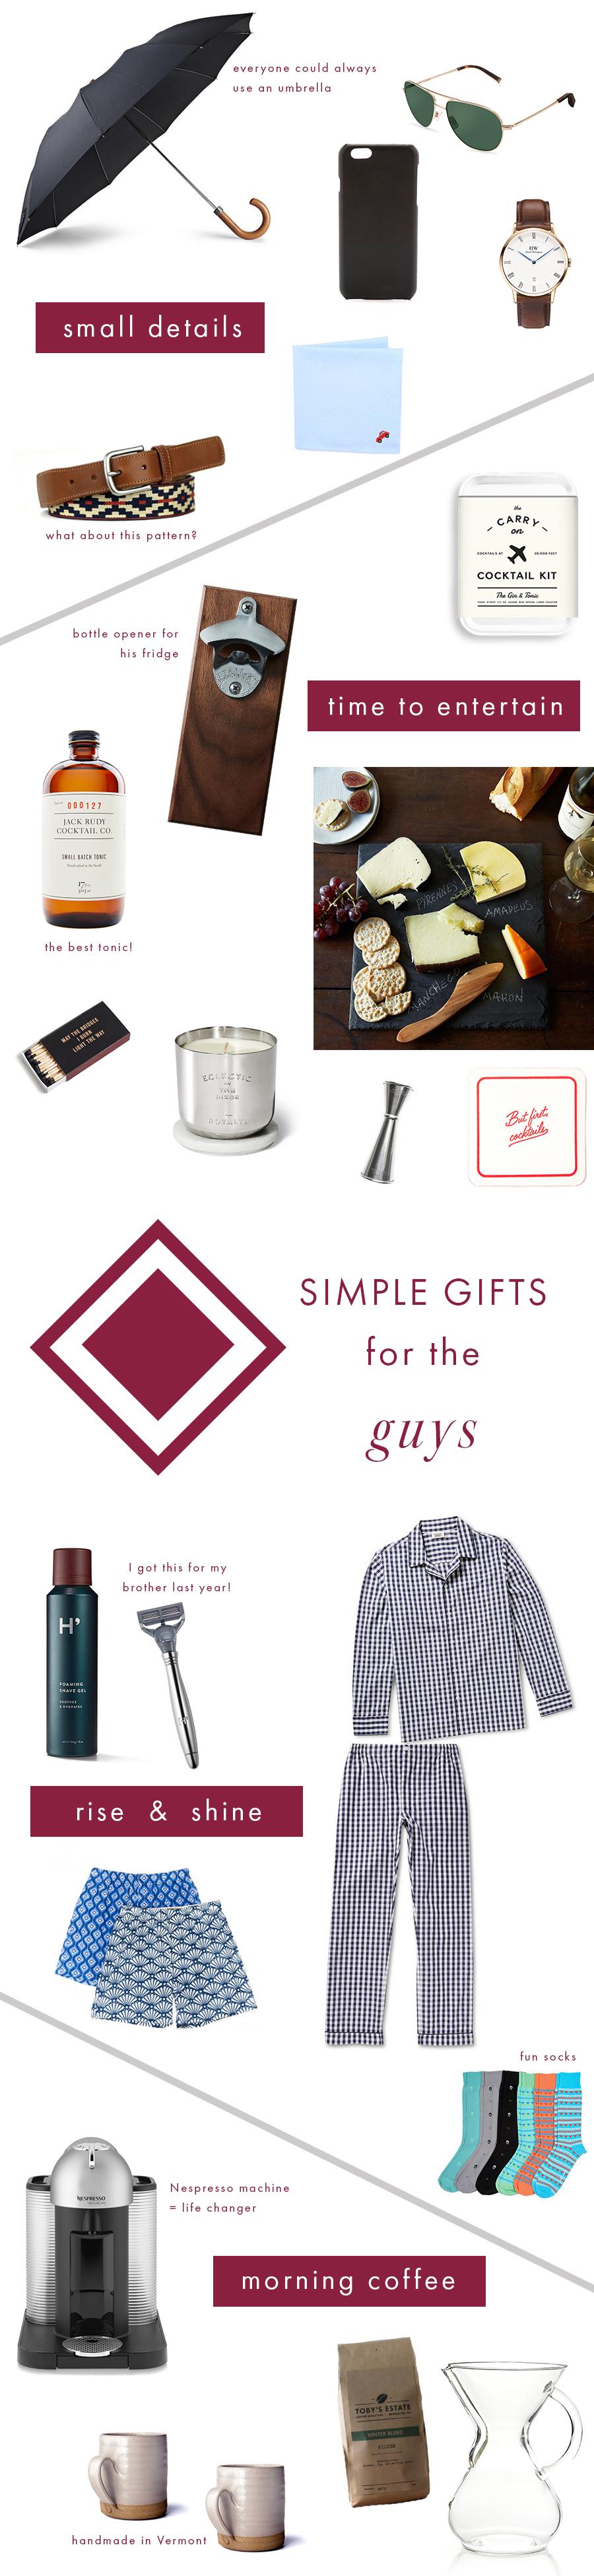 Gift Guide for The Guys - Simply Elegant Blog